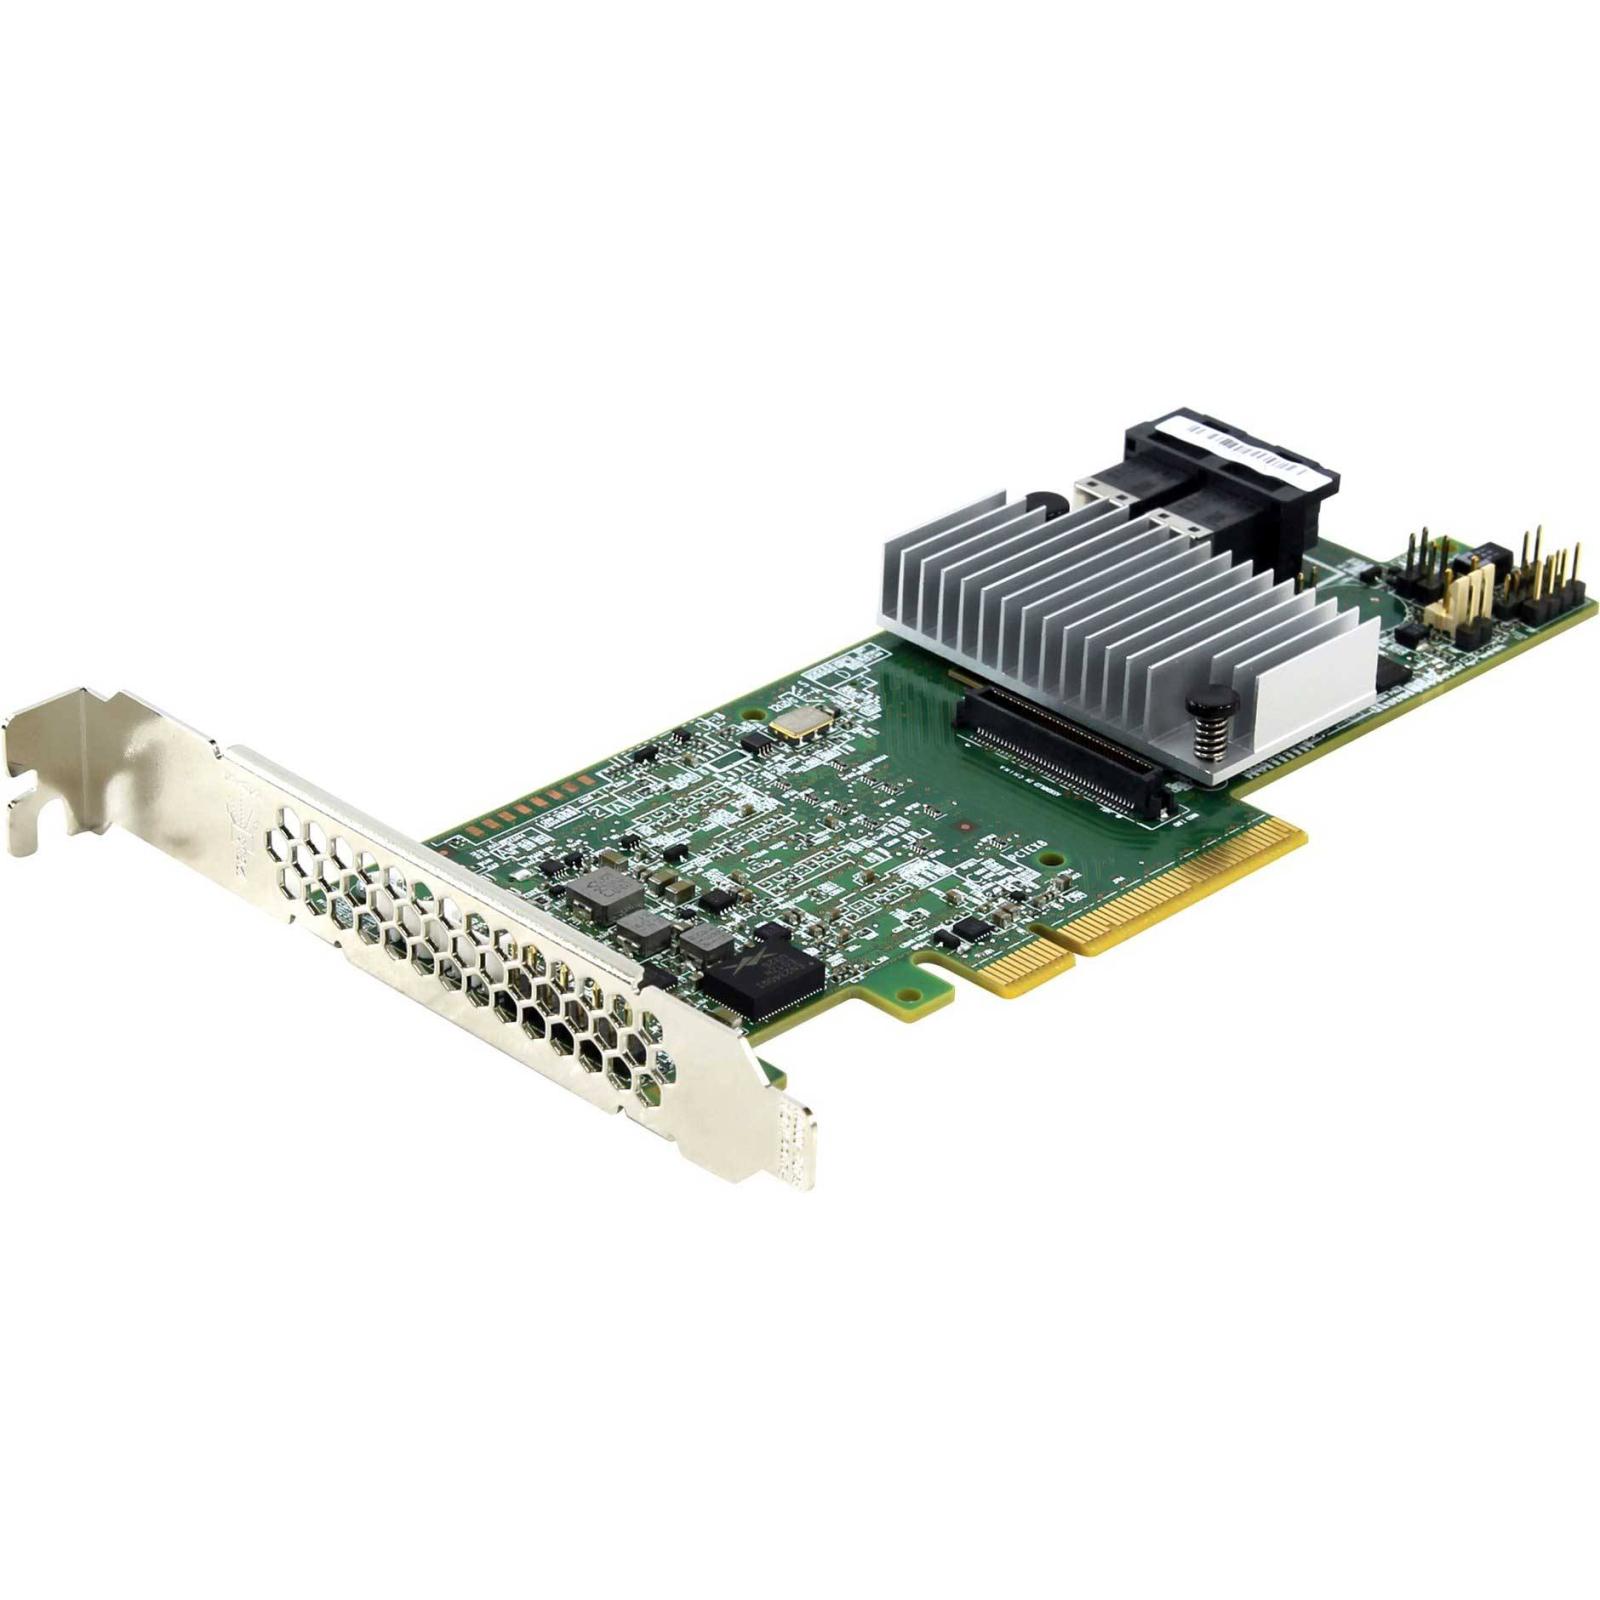 Контроллер RAID LSI MegaRAID SAS 9361-8i (1GB) (05-25420-08) изображение 3